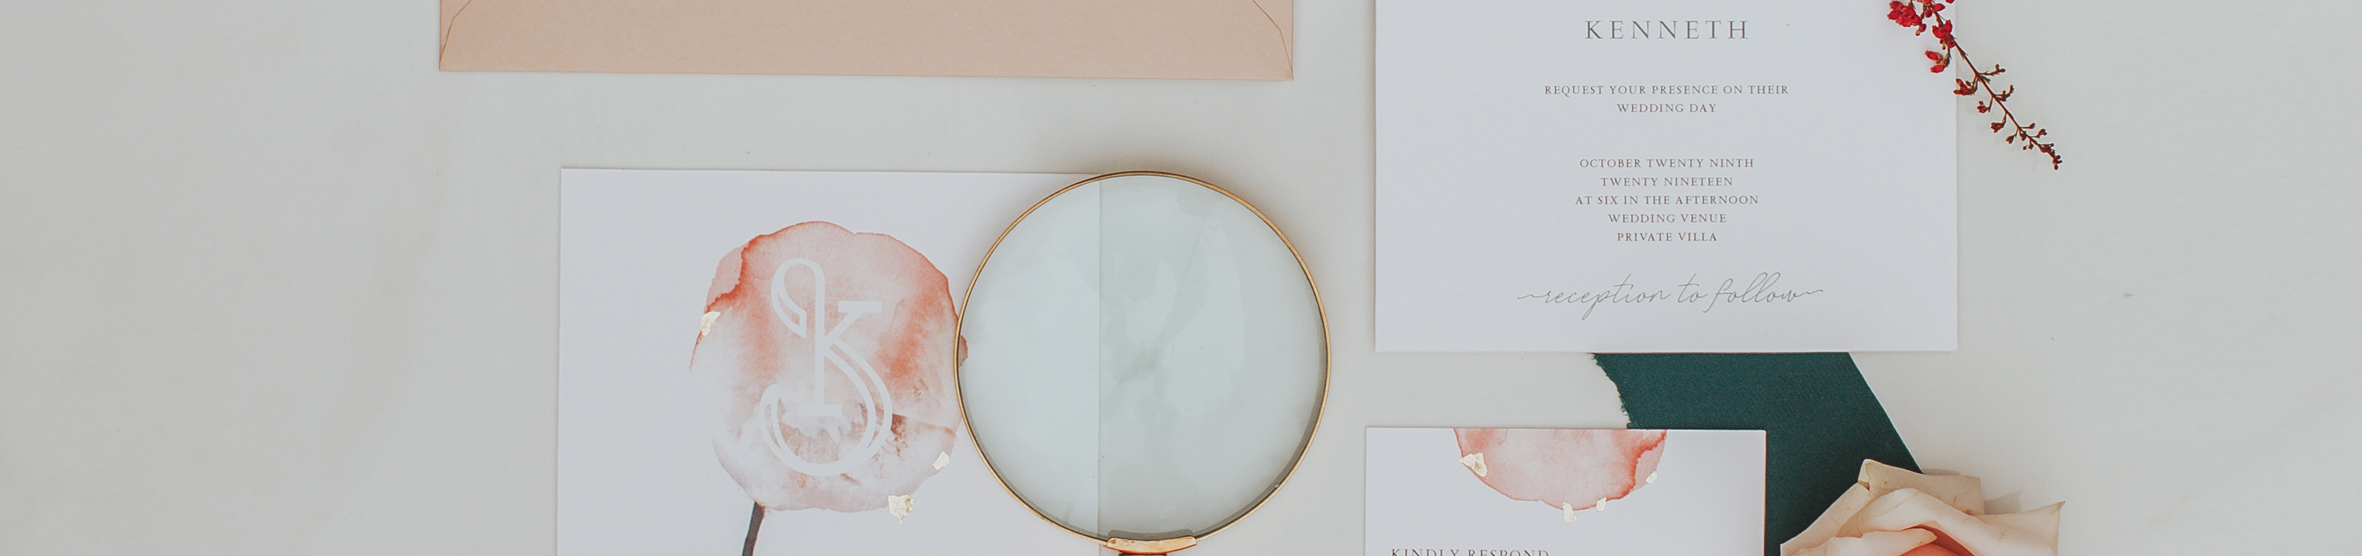 3efbf7b6cb31 Το χρώμα του 2019 – Προσθέστε ζωντάνια   ζεστασιά στο προσκλητήριο γάμου σας